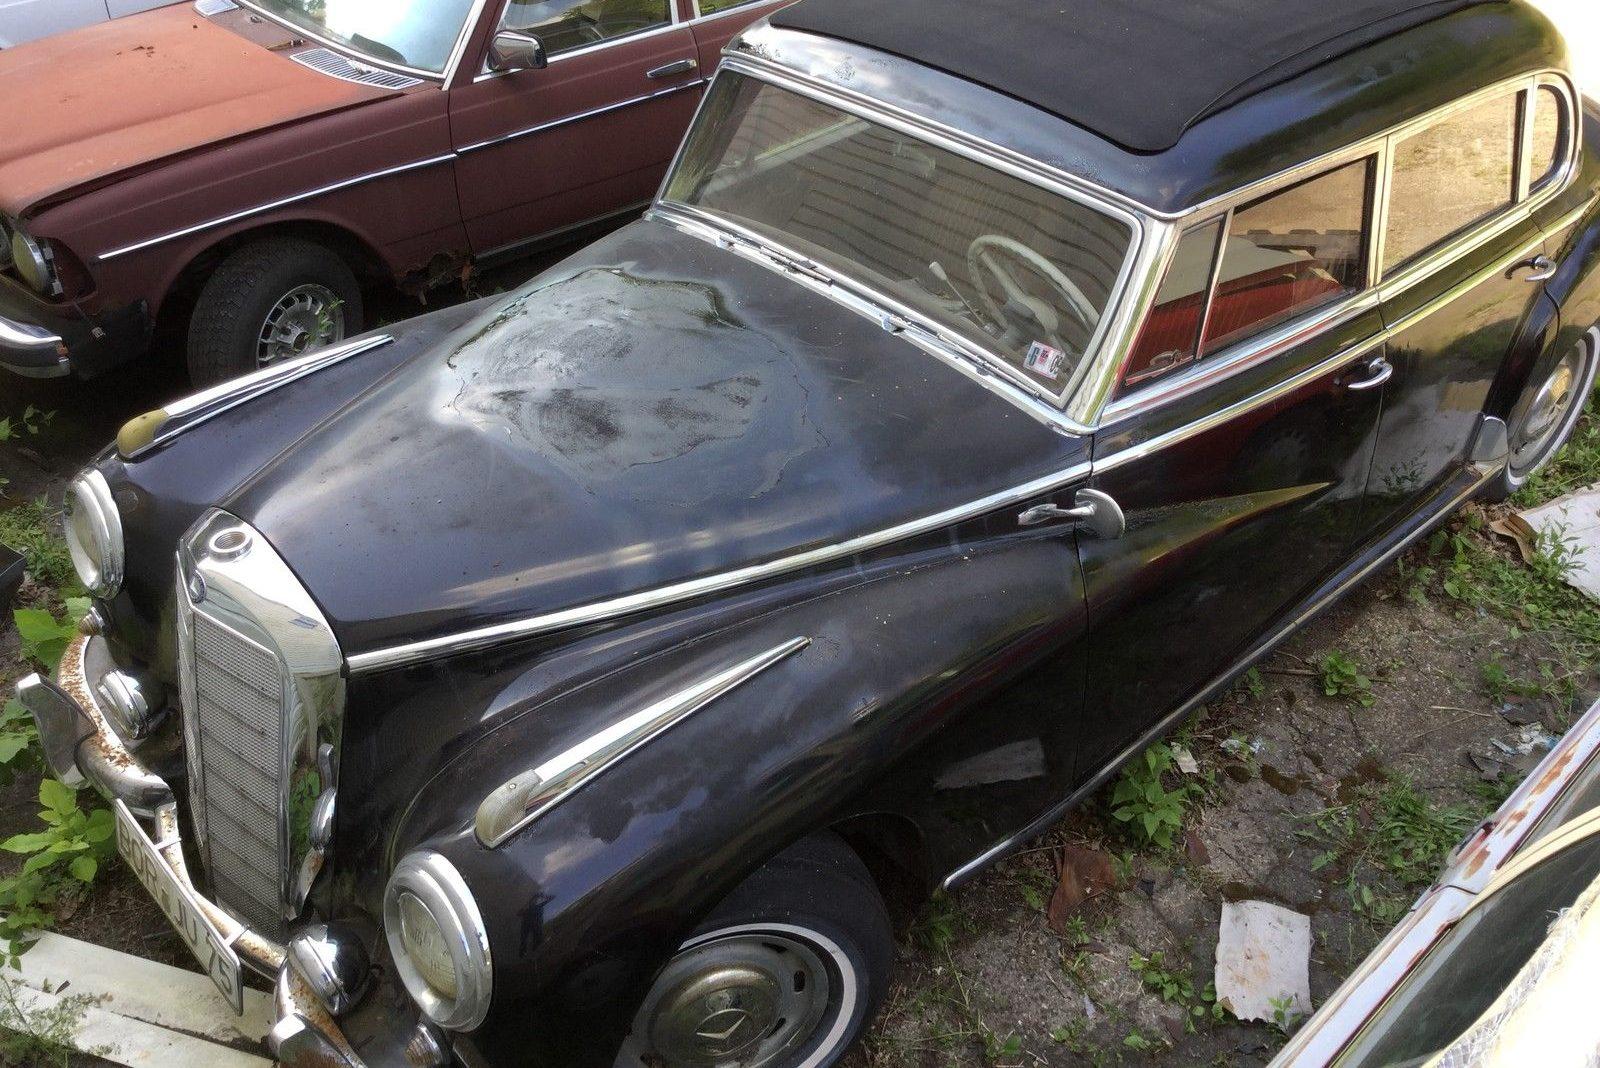 World's Largest Sunroof! 1955 Mercedes-Benz 300C Adenauer